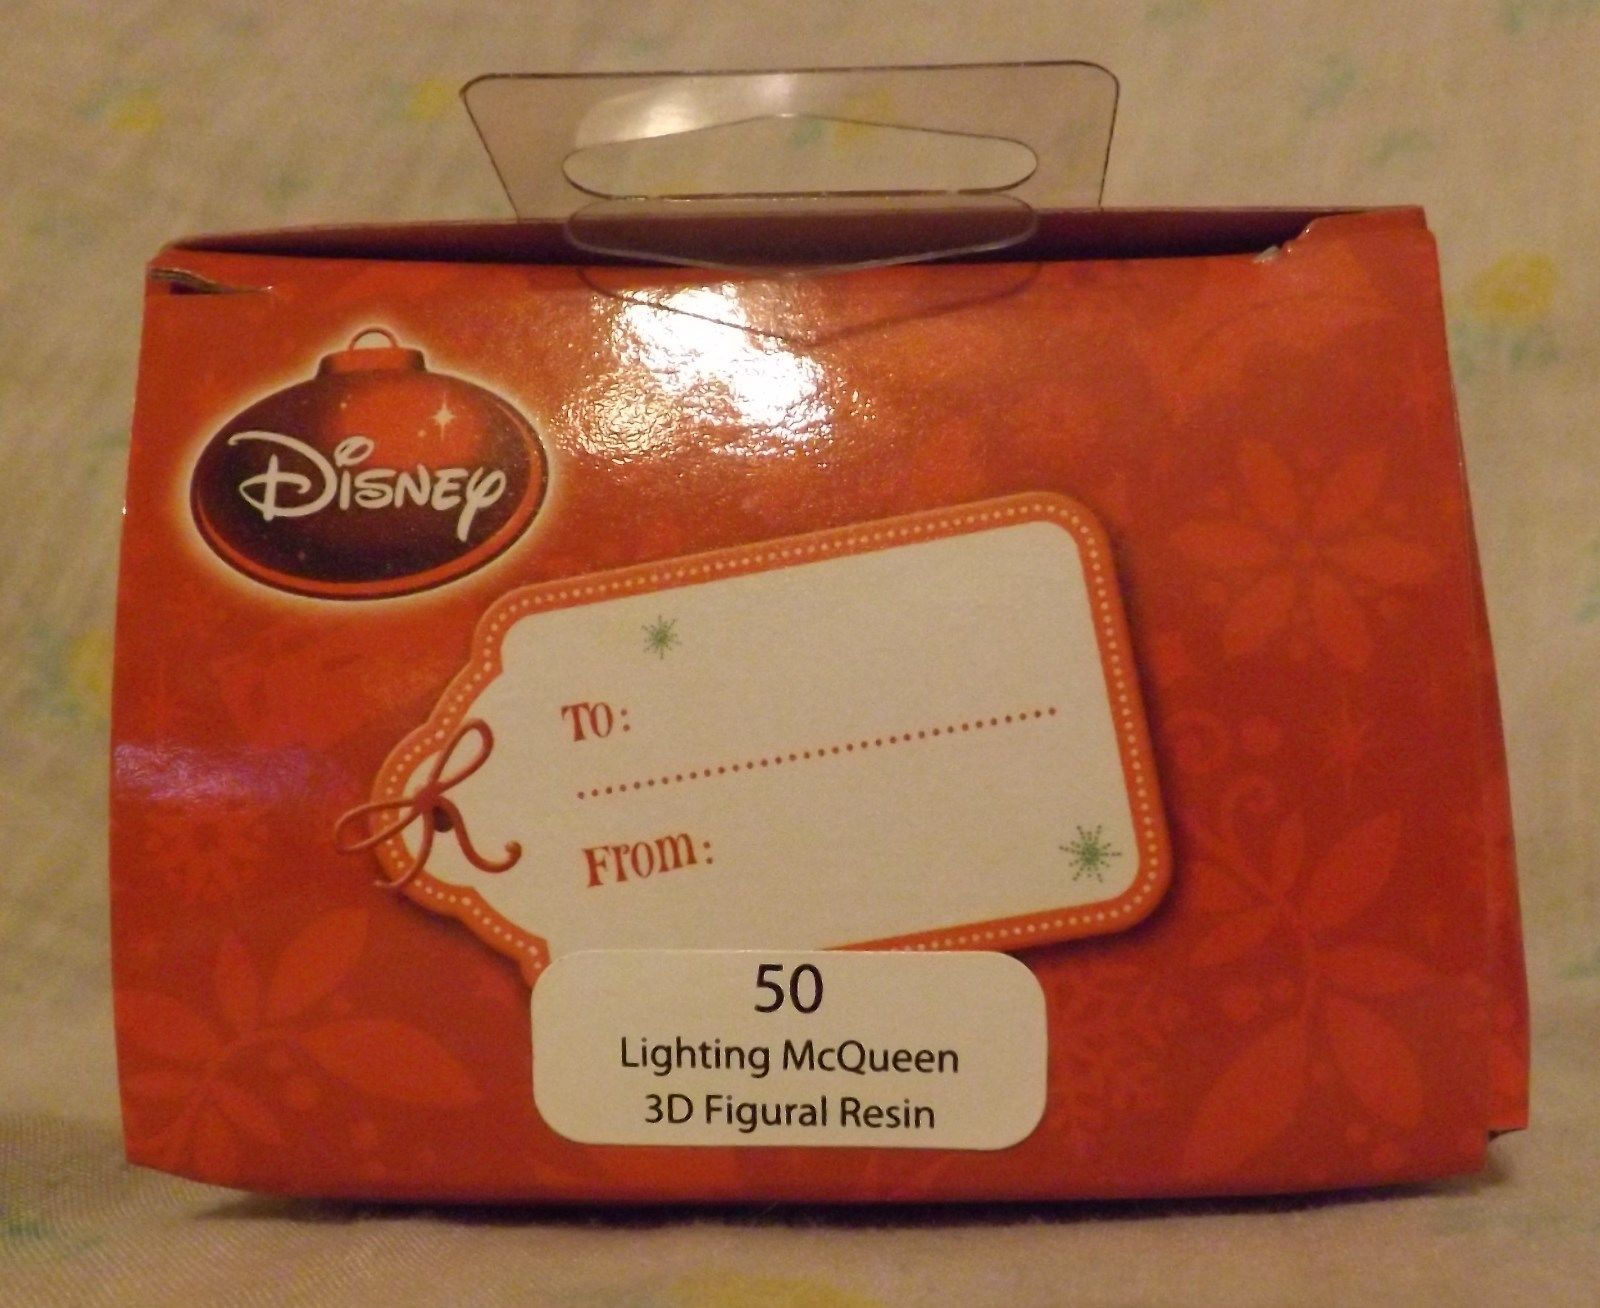 Disney Lightning McQueen 3D Figural Resin Ornament 2013 image 2